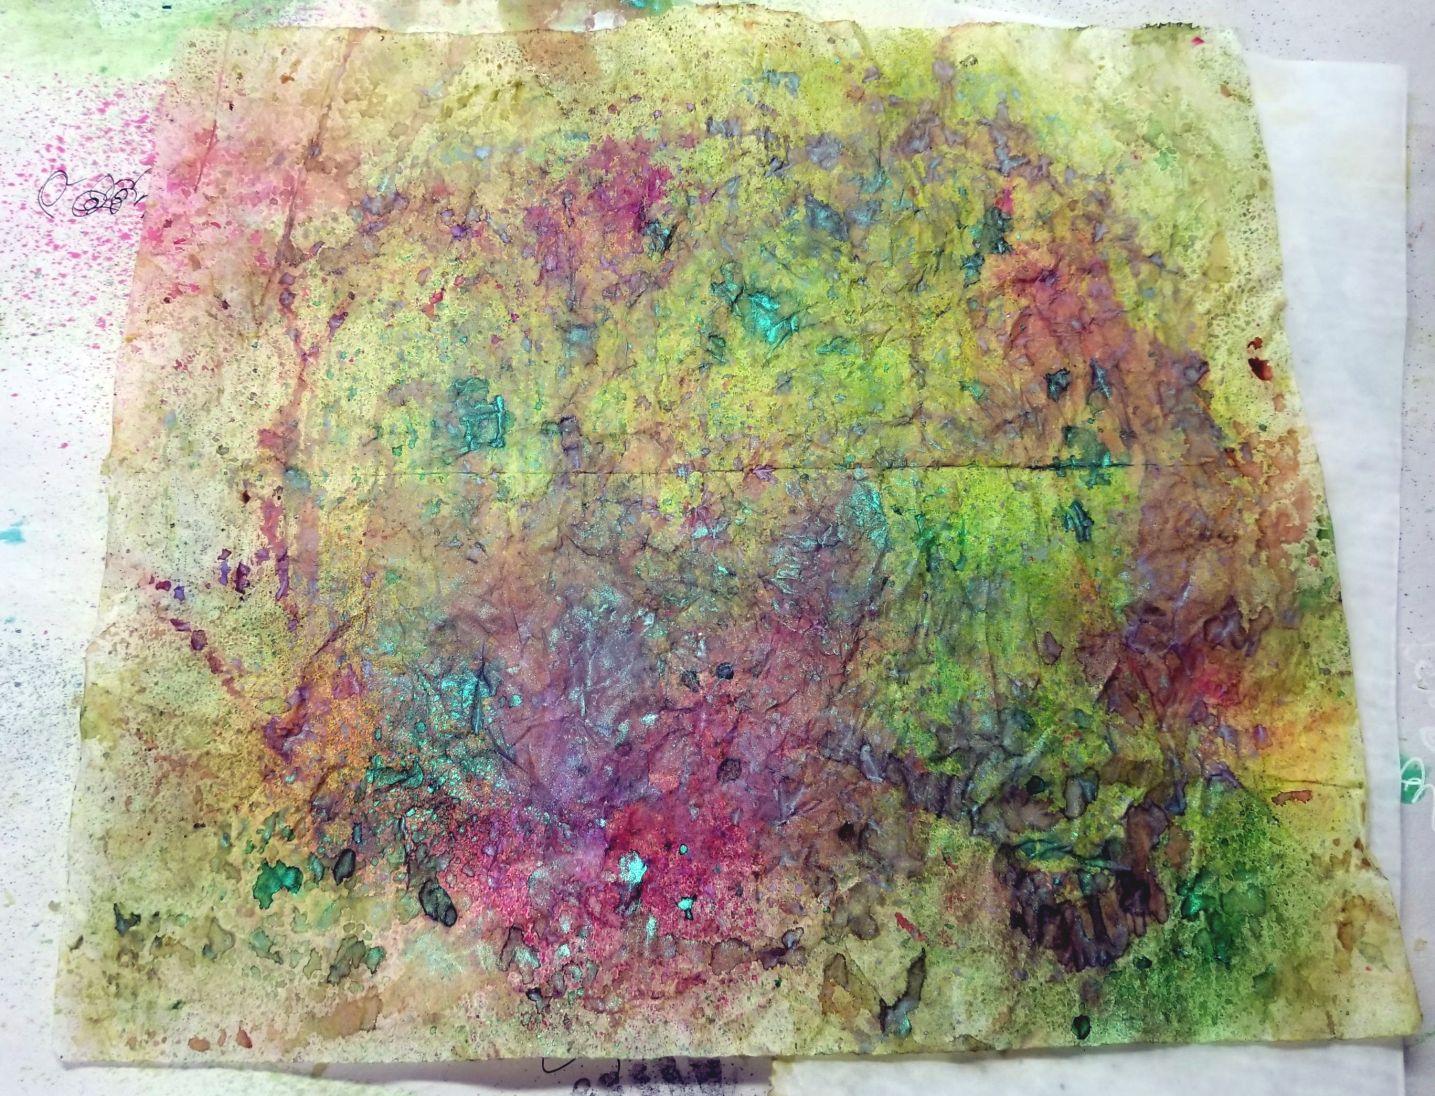 oxide inks & spray inks on deli paper